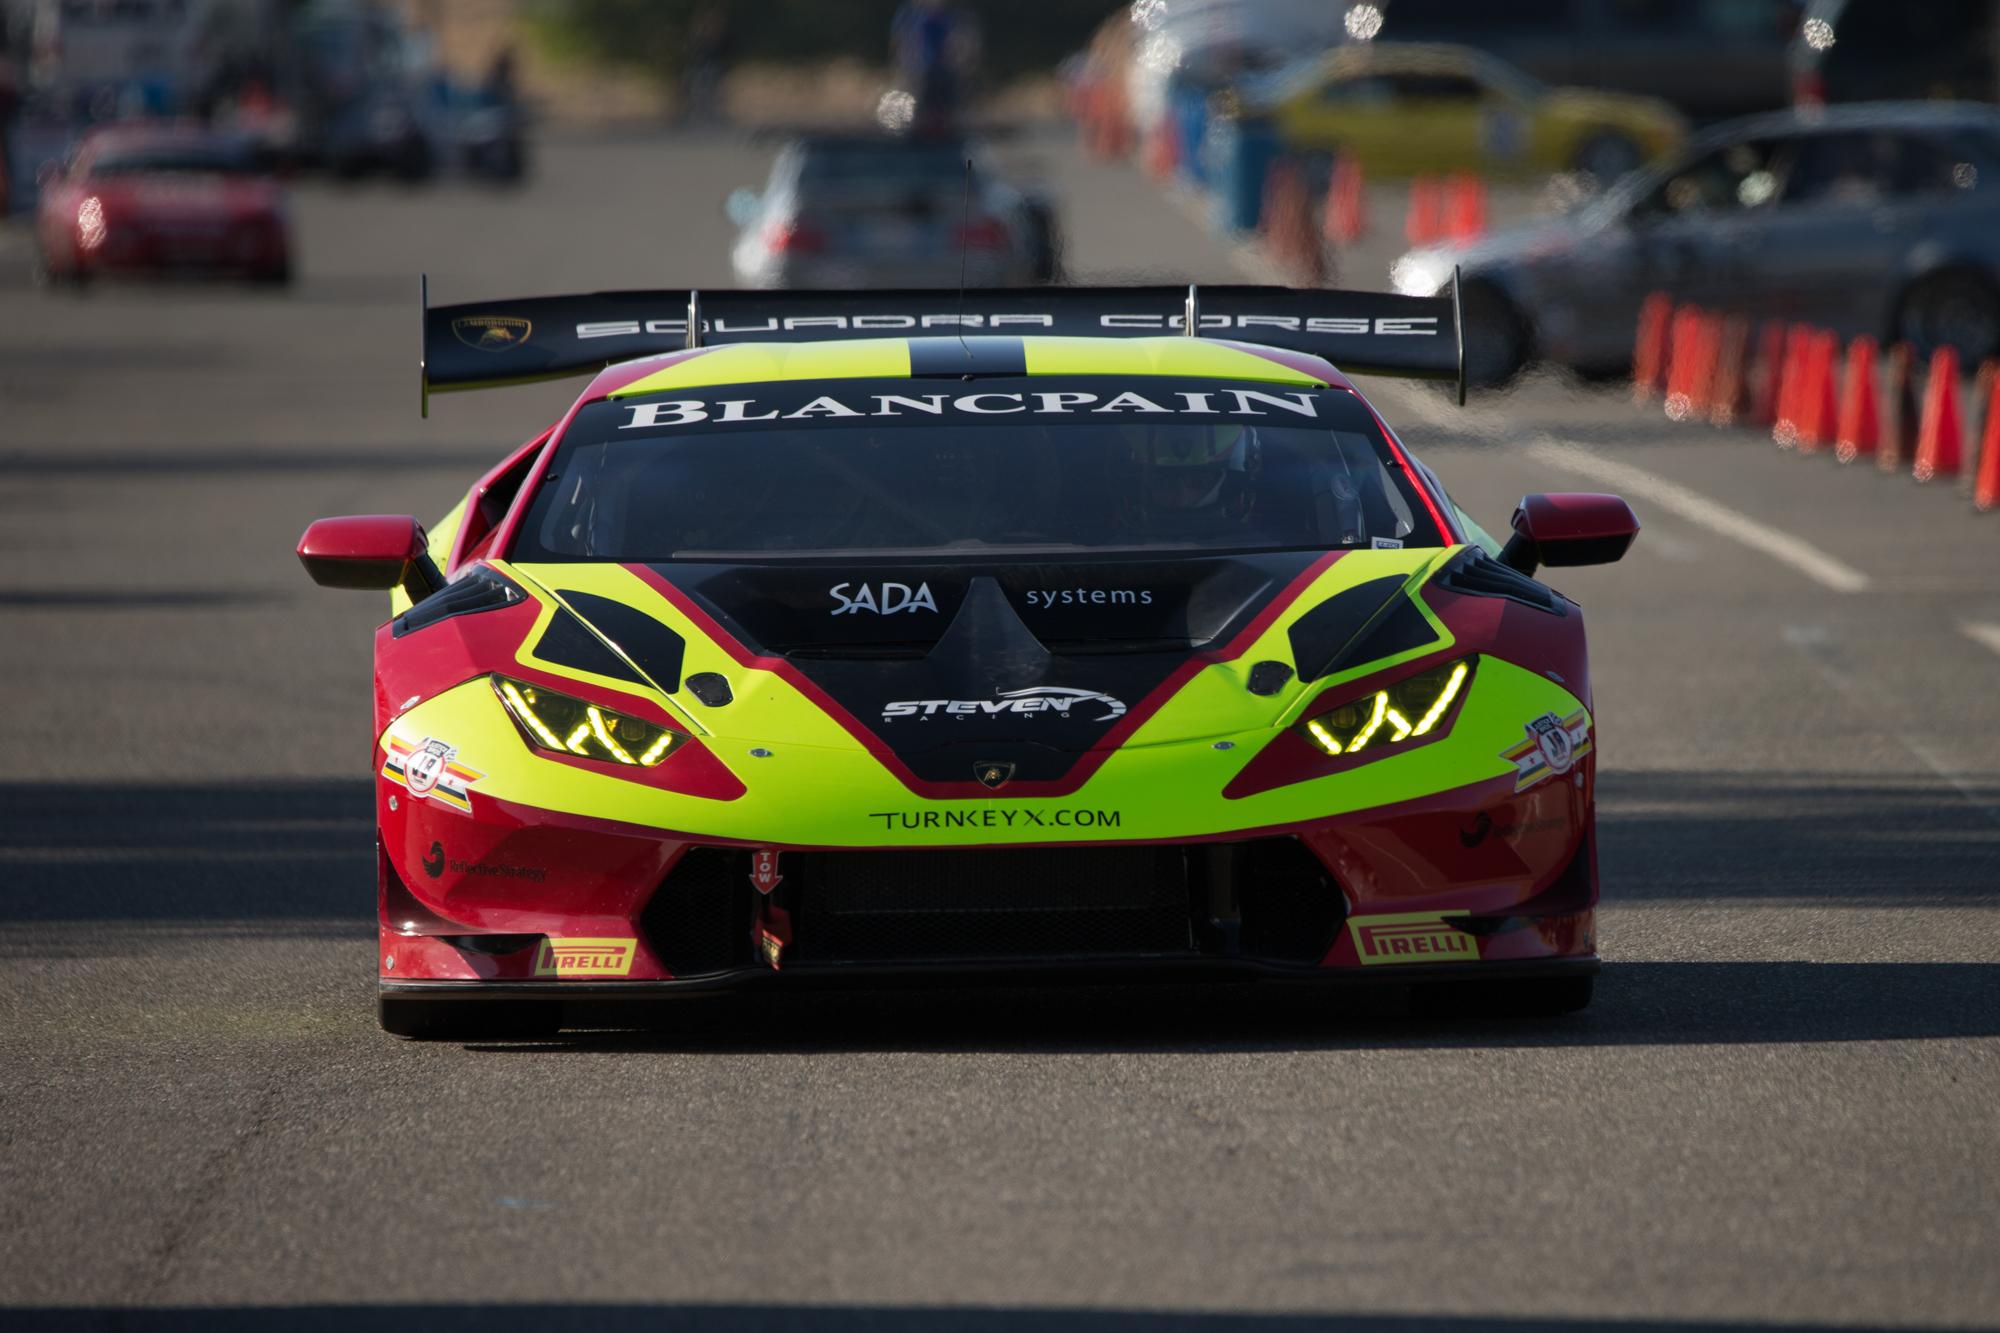 Steven-Racing-20171005-44307.jpg